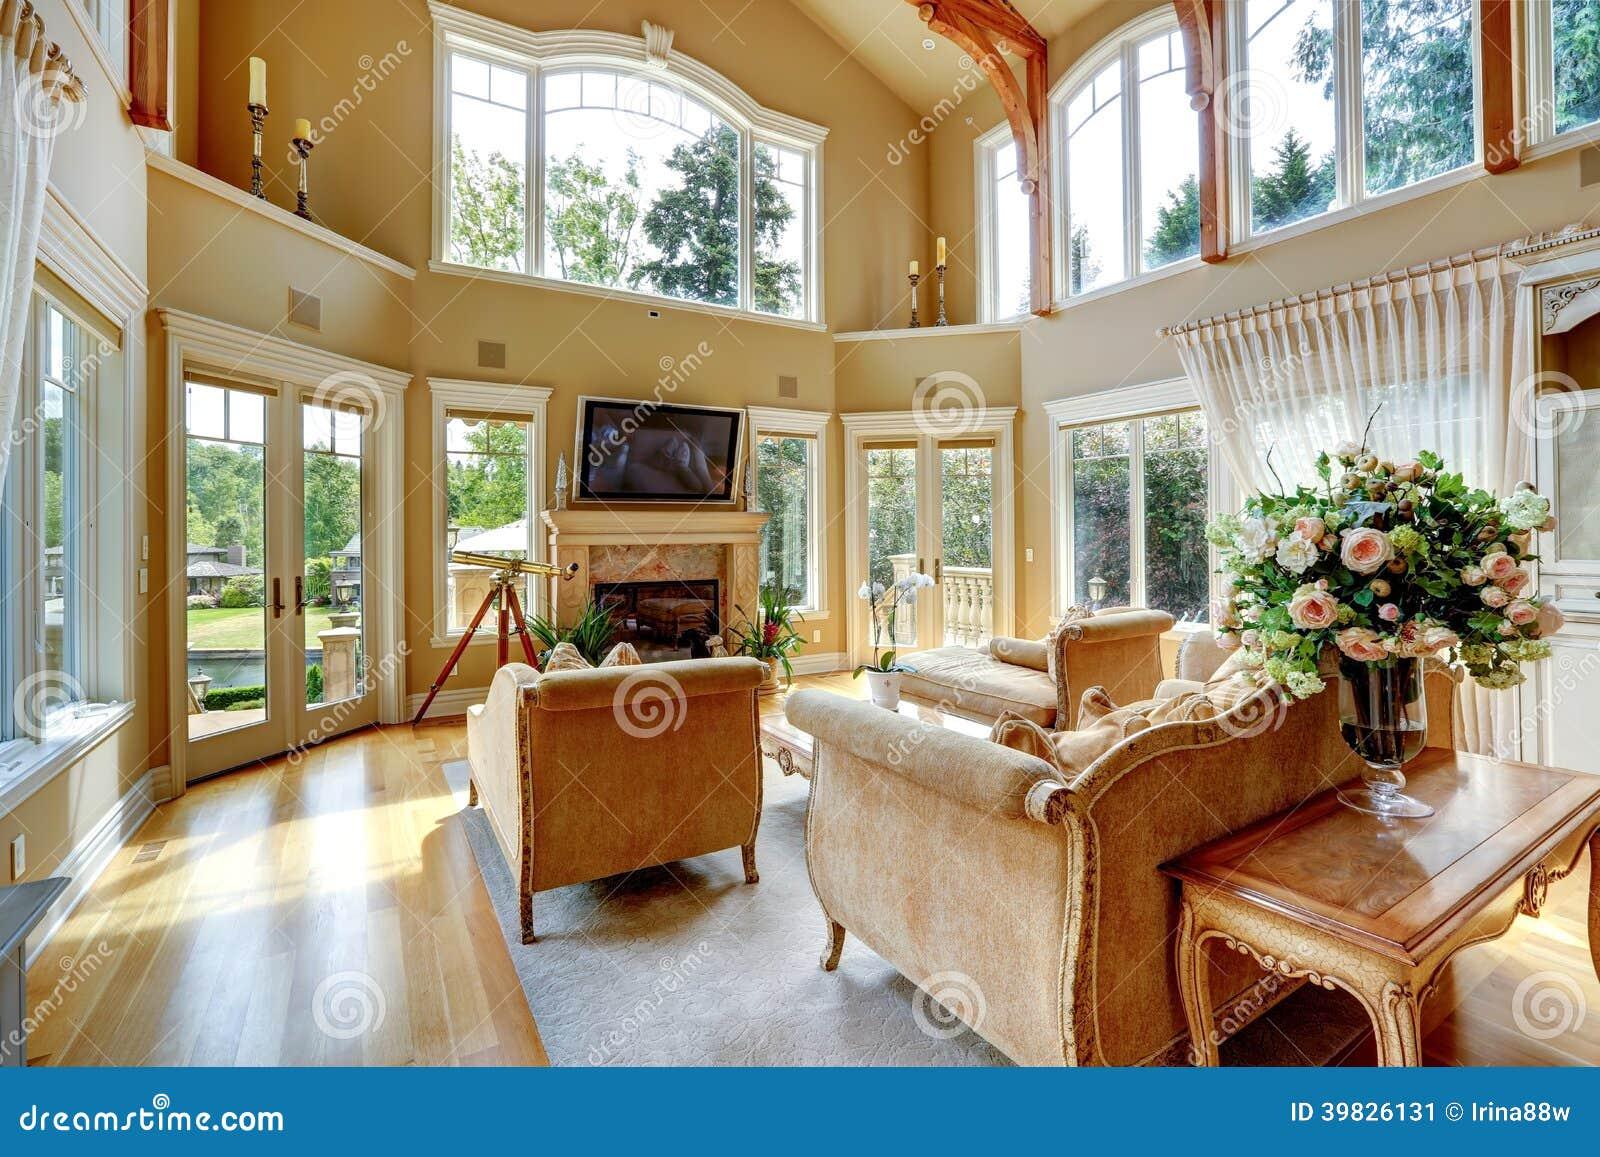 Luxury house interior living room with walkout deck stock for Sala de estar antigua